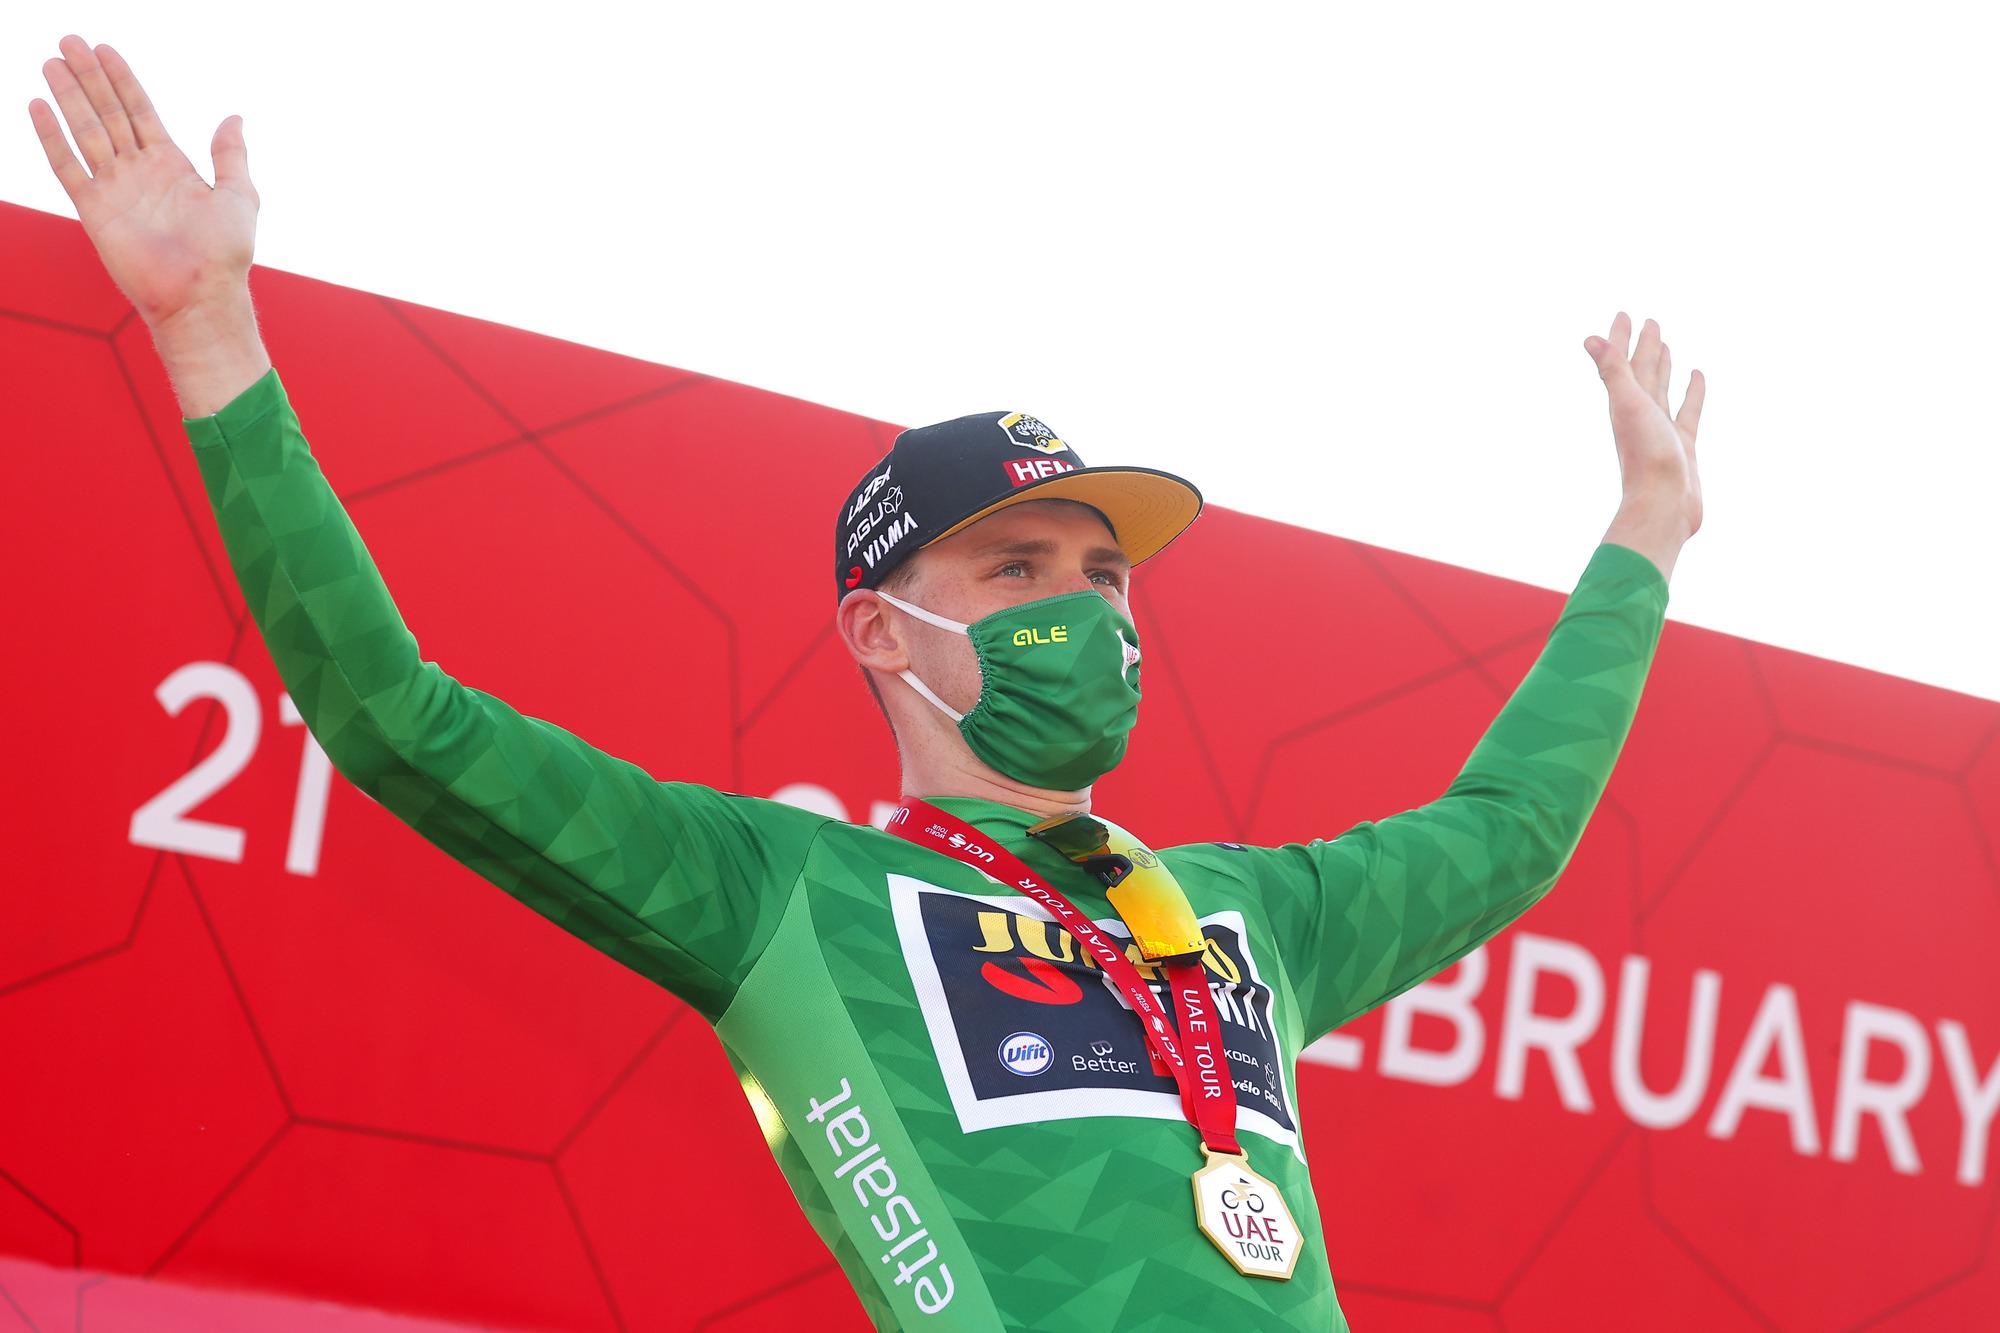 David Dekker (Jumbo-Visma) took the green points jersey at the UAE Tour